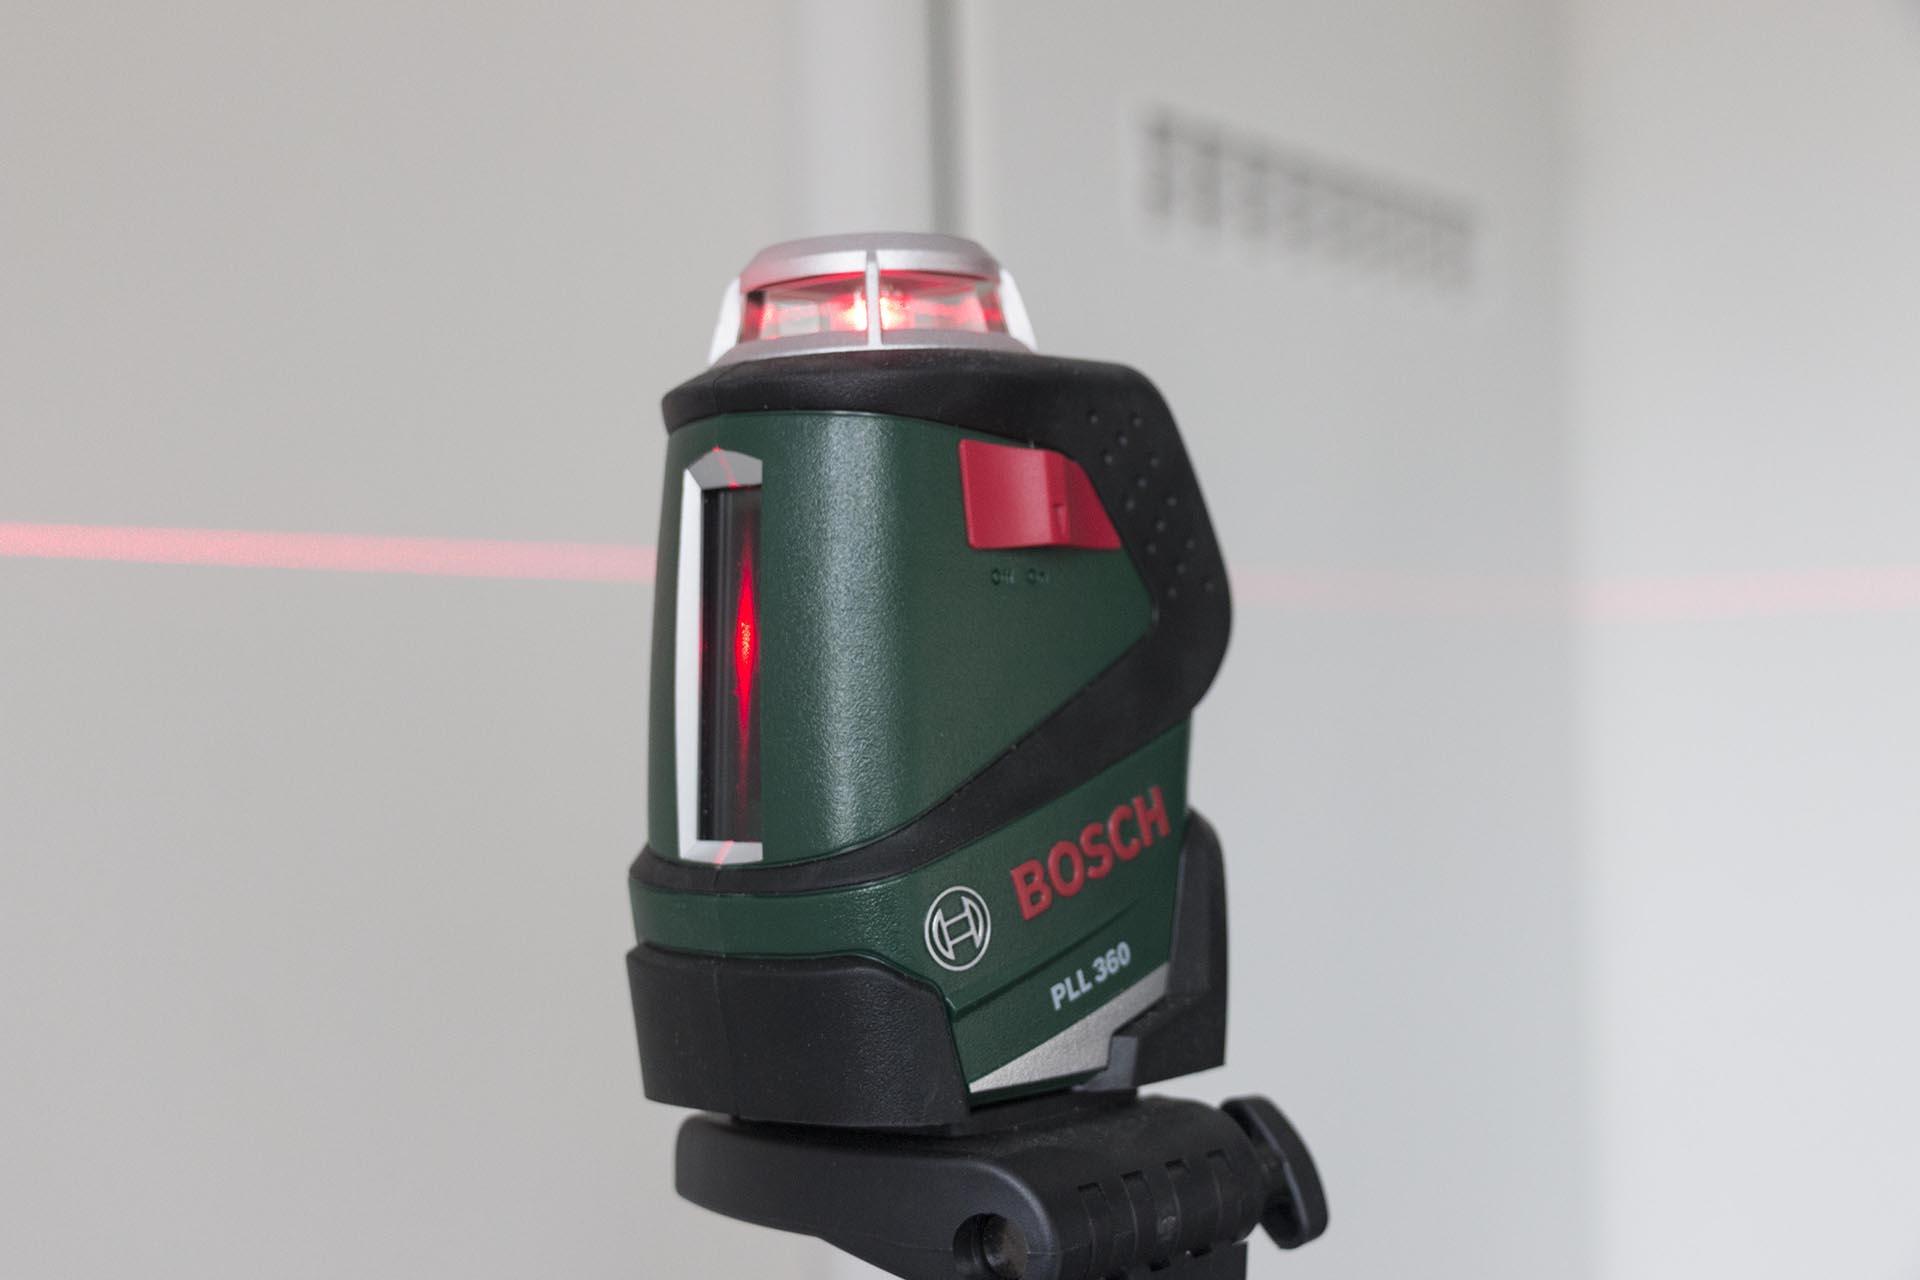 Review bosch pll 360 kruislijnlaser laserwaterpas - Laser bosch pll 360 ...